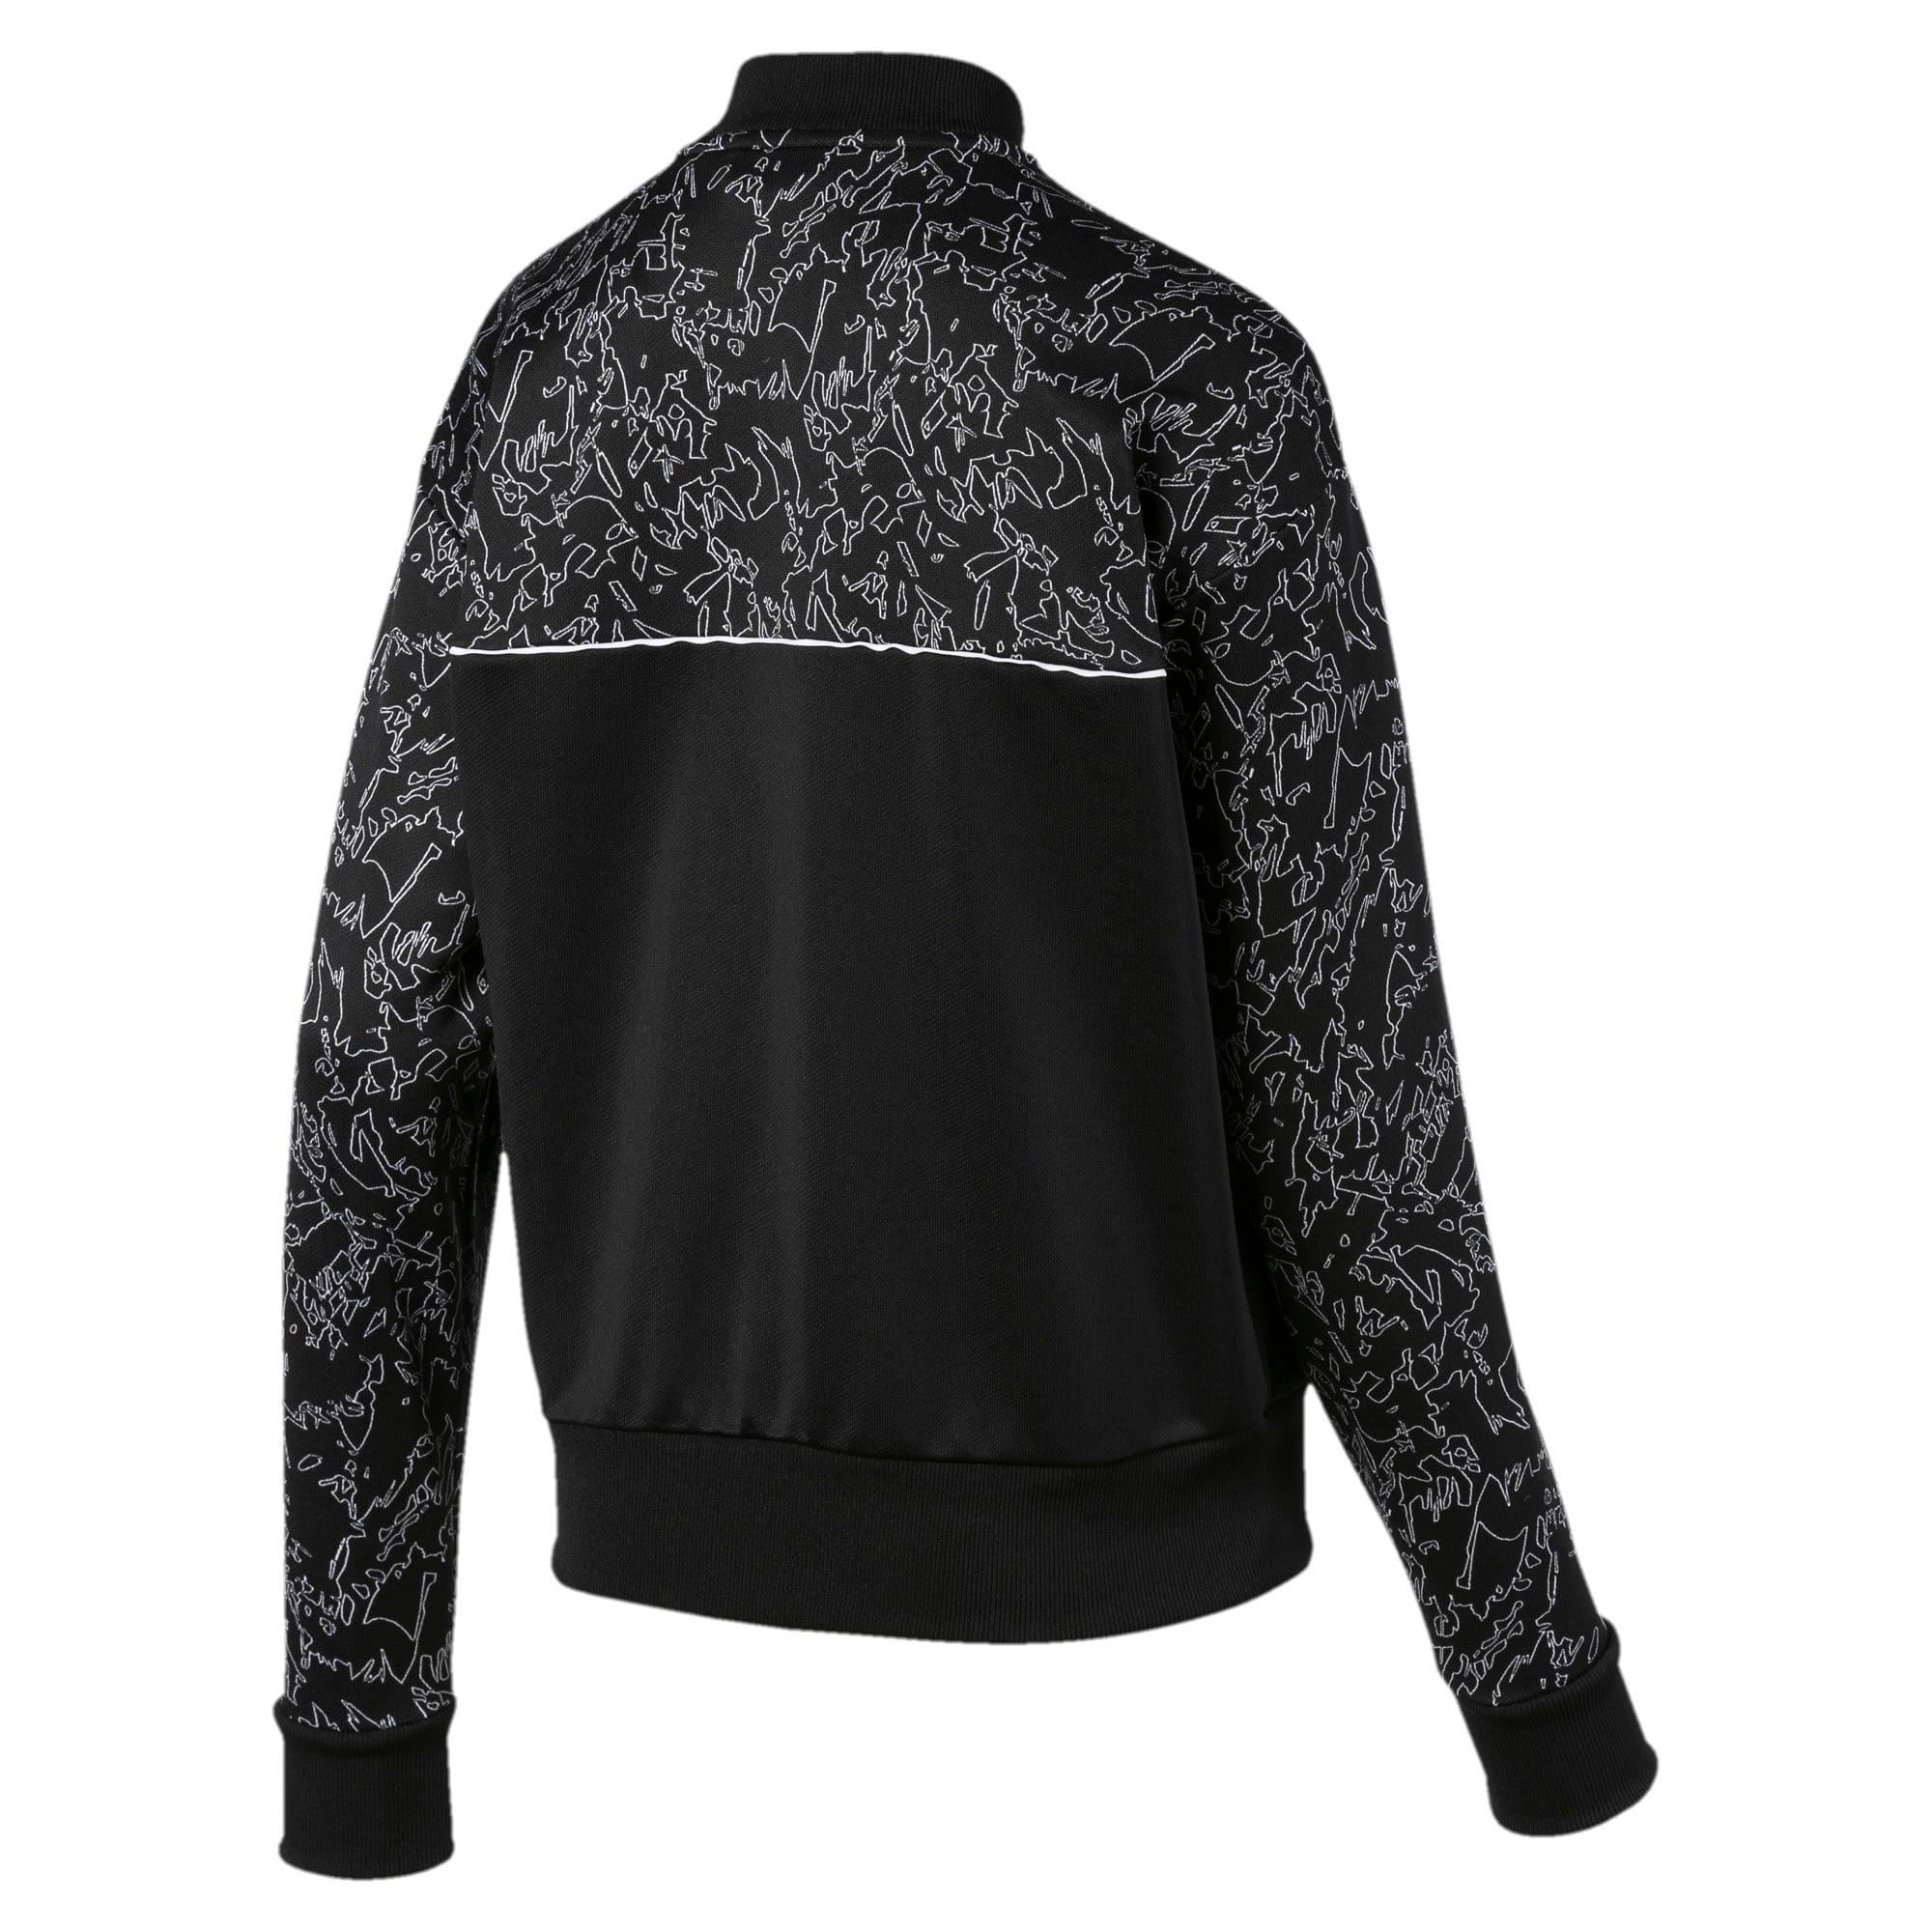 Thumbnail 5 of Full Zip Women's Track Jacket, Puma Black, medium